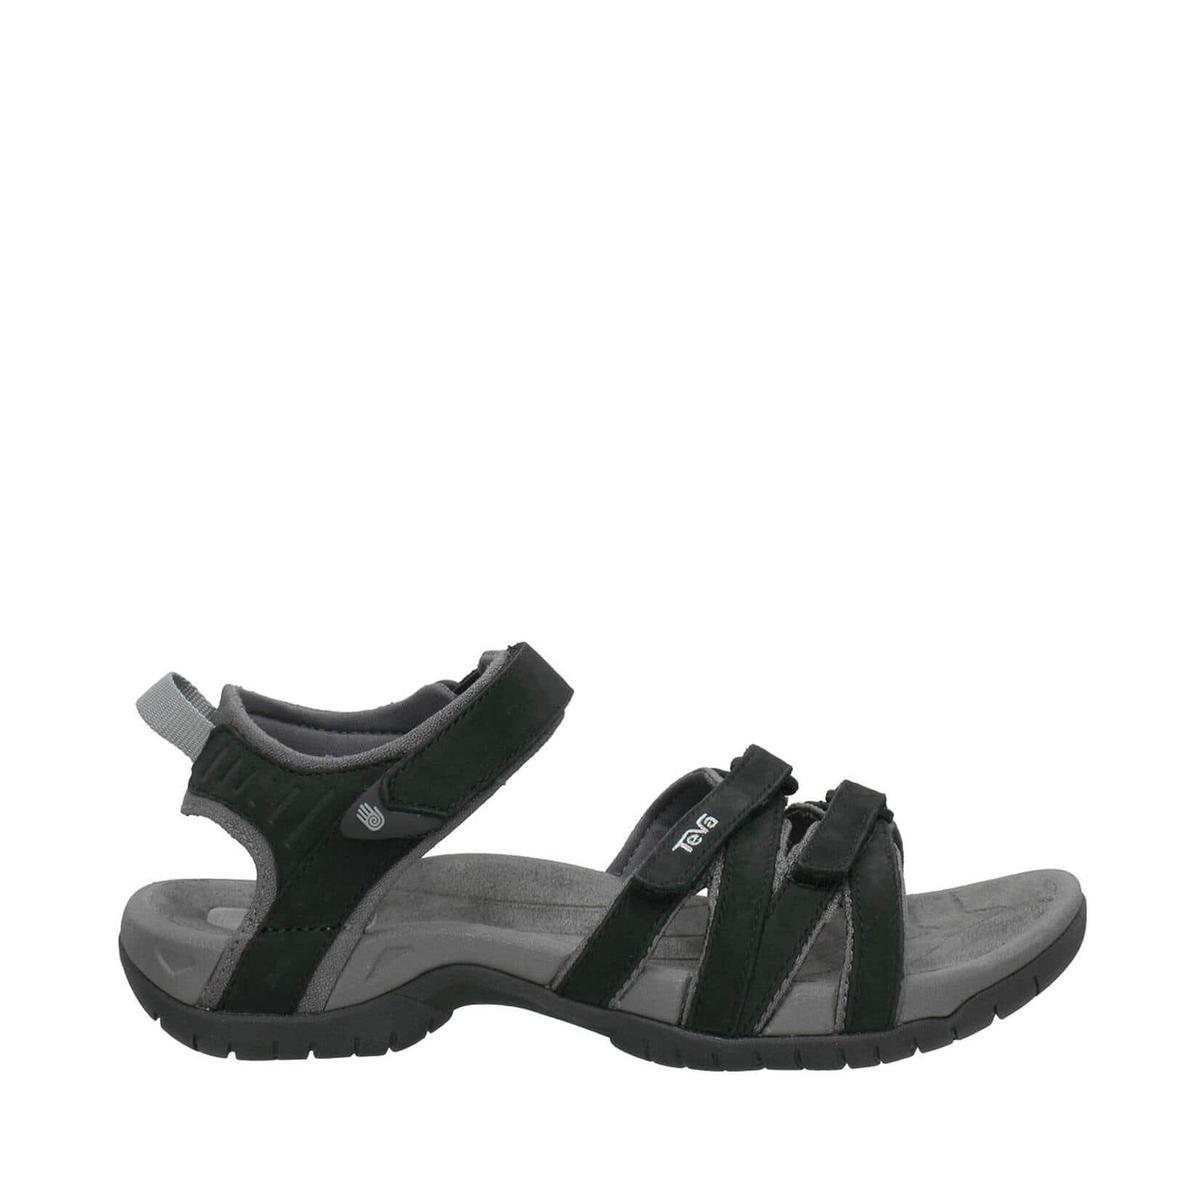 Teva Women's Teva Tirra Leather - Black